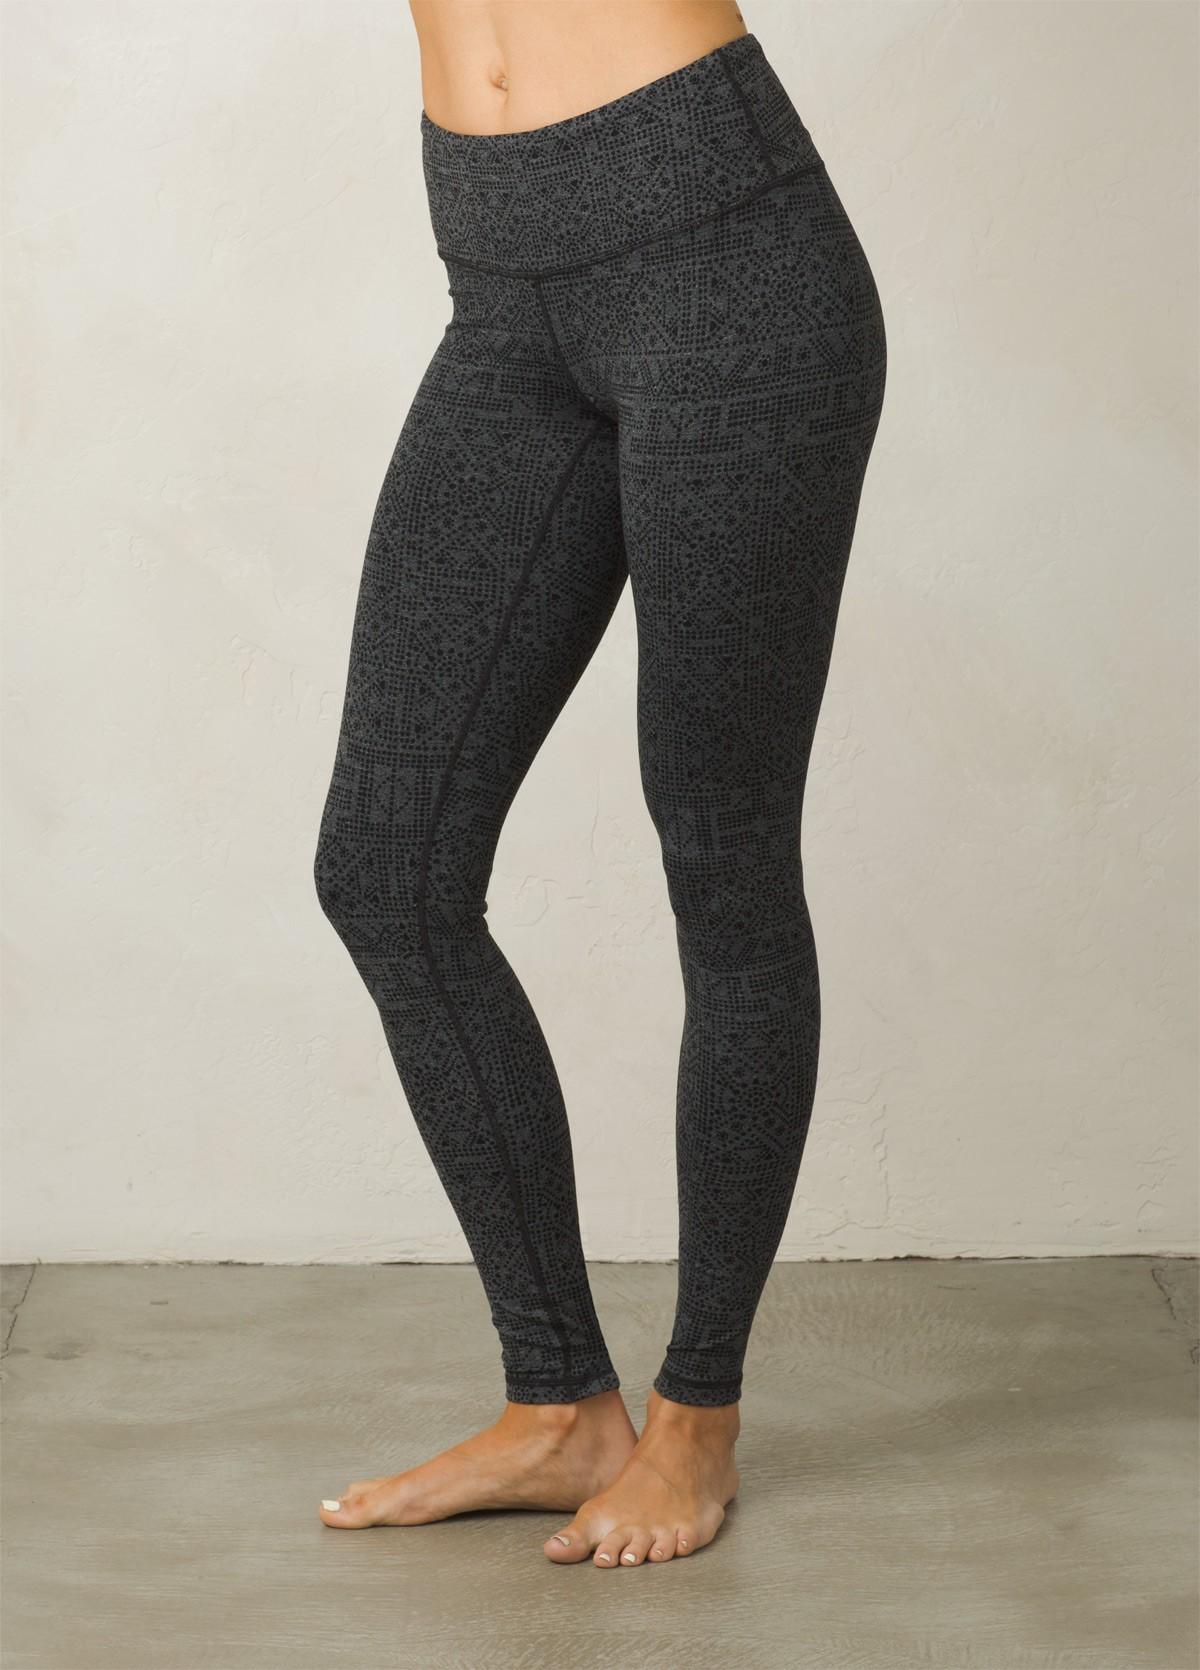 yoga wear charcoal heather mosaic pillar legging   women u003e bottoms u003e yoga pants ... lxswvst